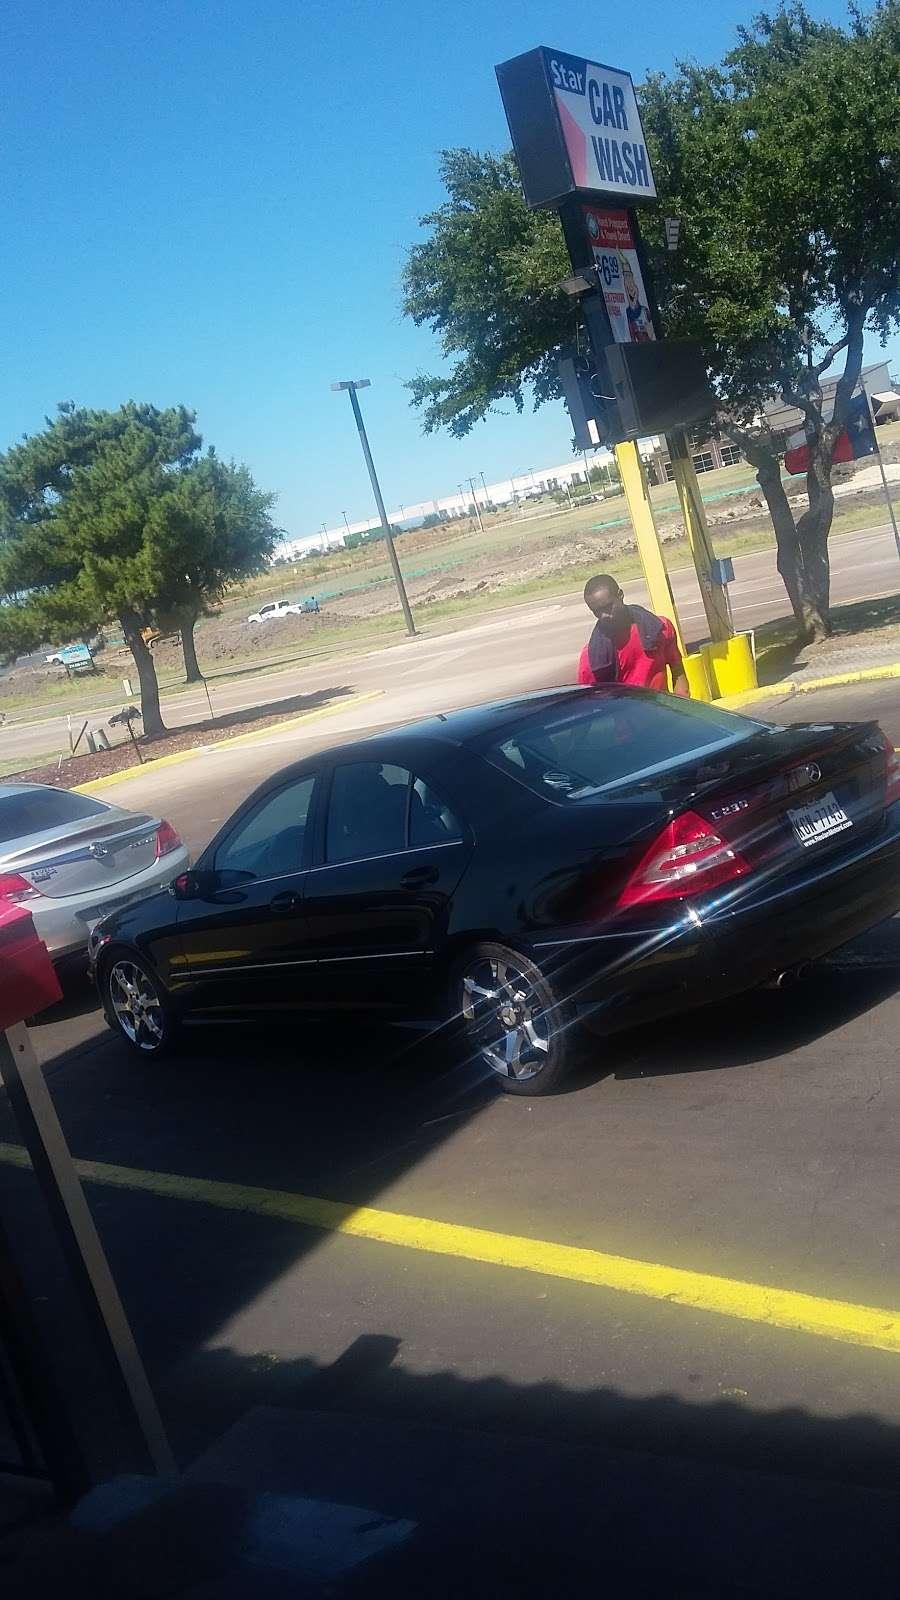 Star Car Wash - car wash    Photo 6 of 10   Address: 2111 N Hampton Rd, DeSoto, TX 75115, USA   Phone: (972) 298-5772